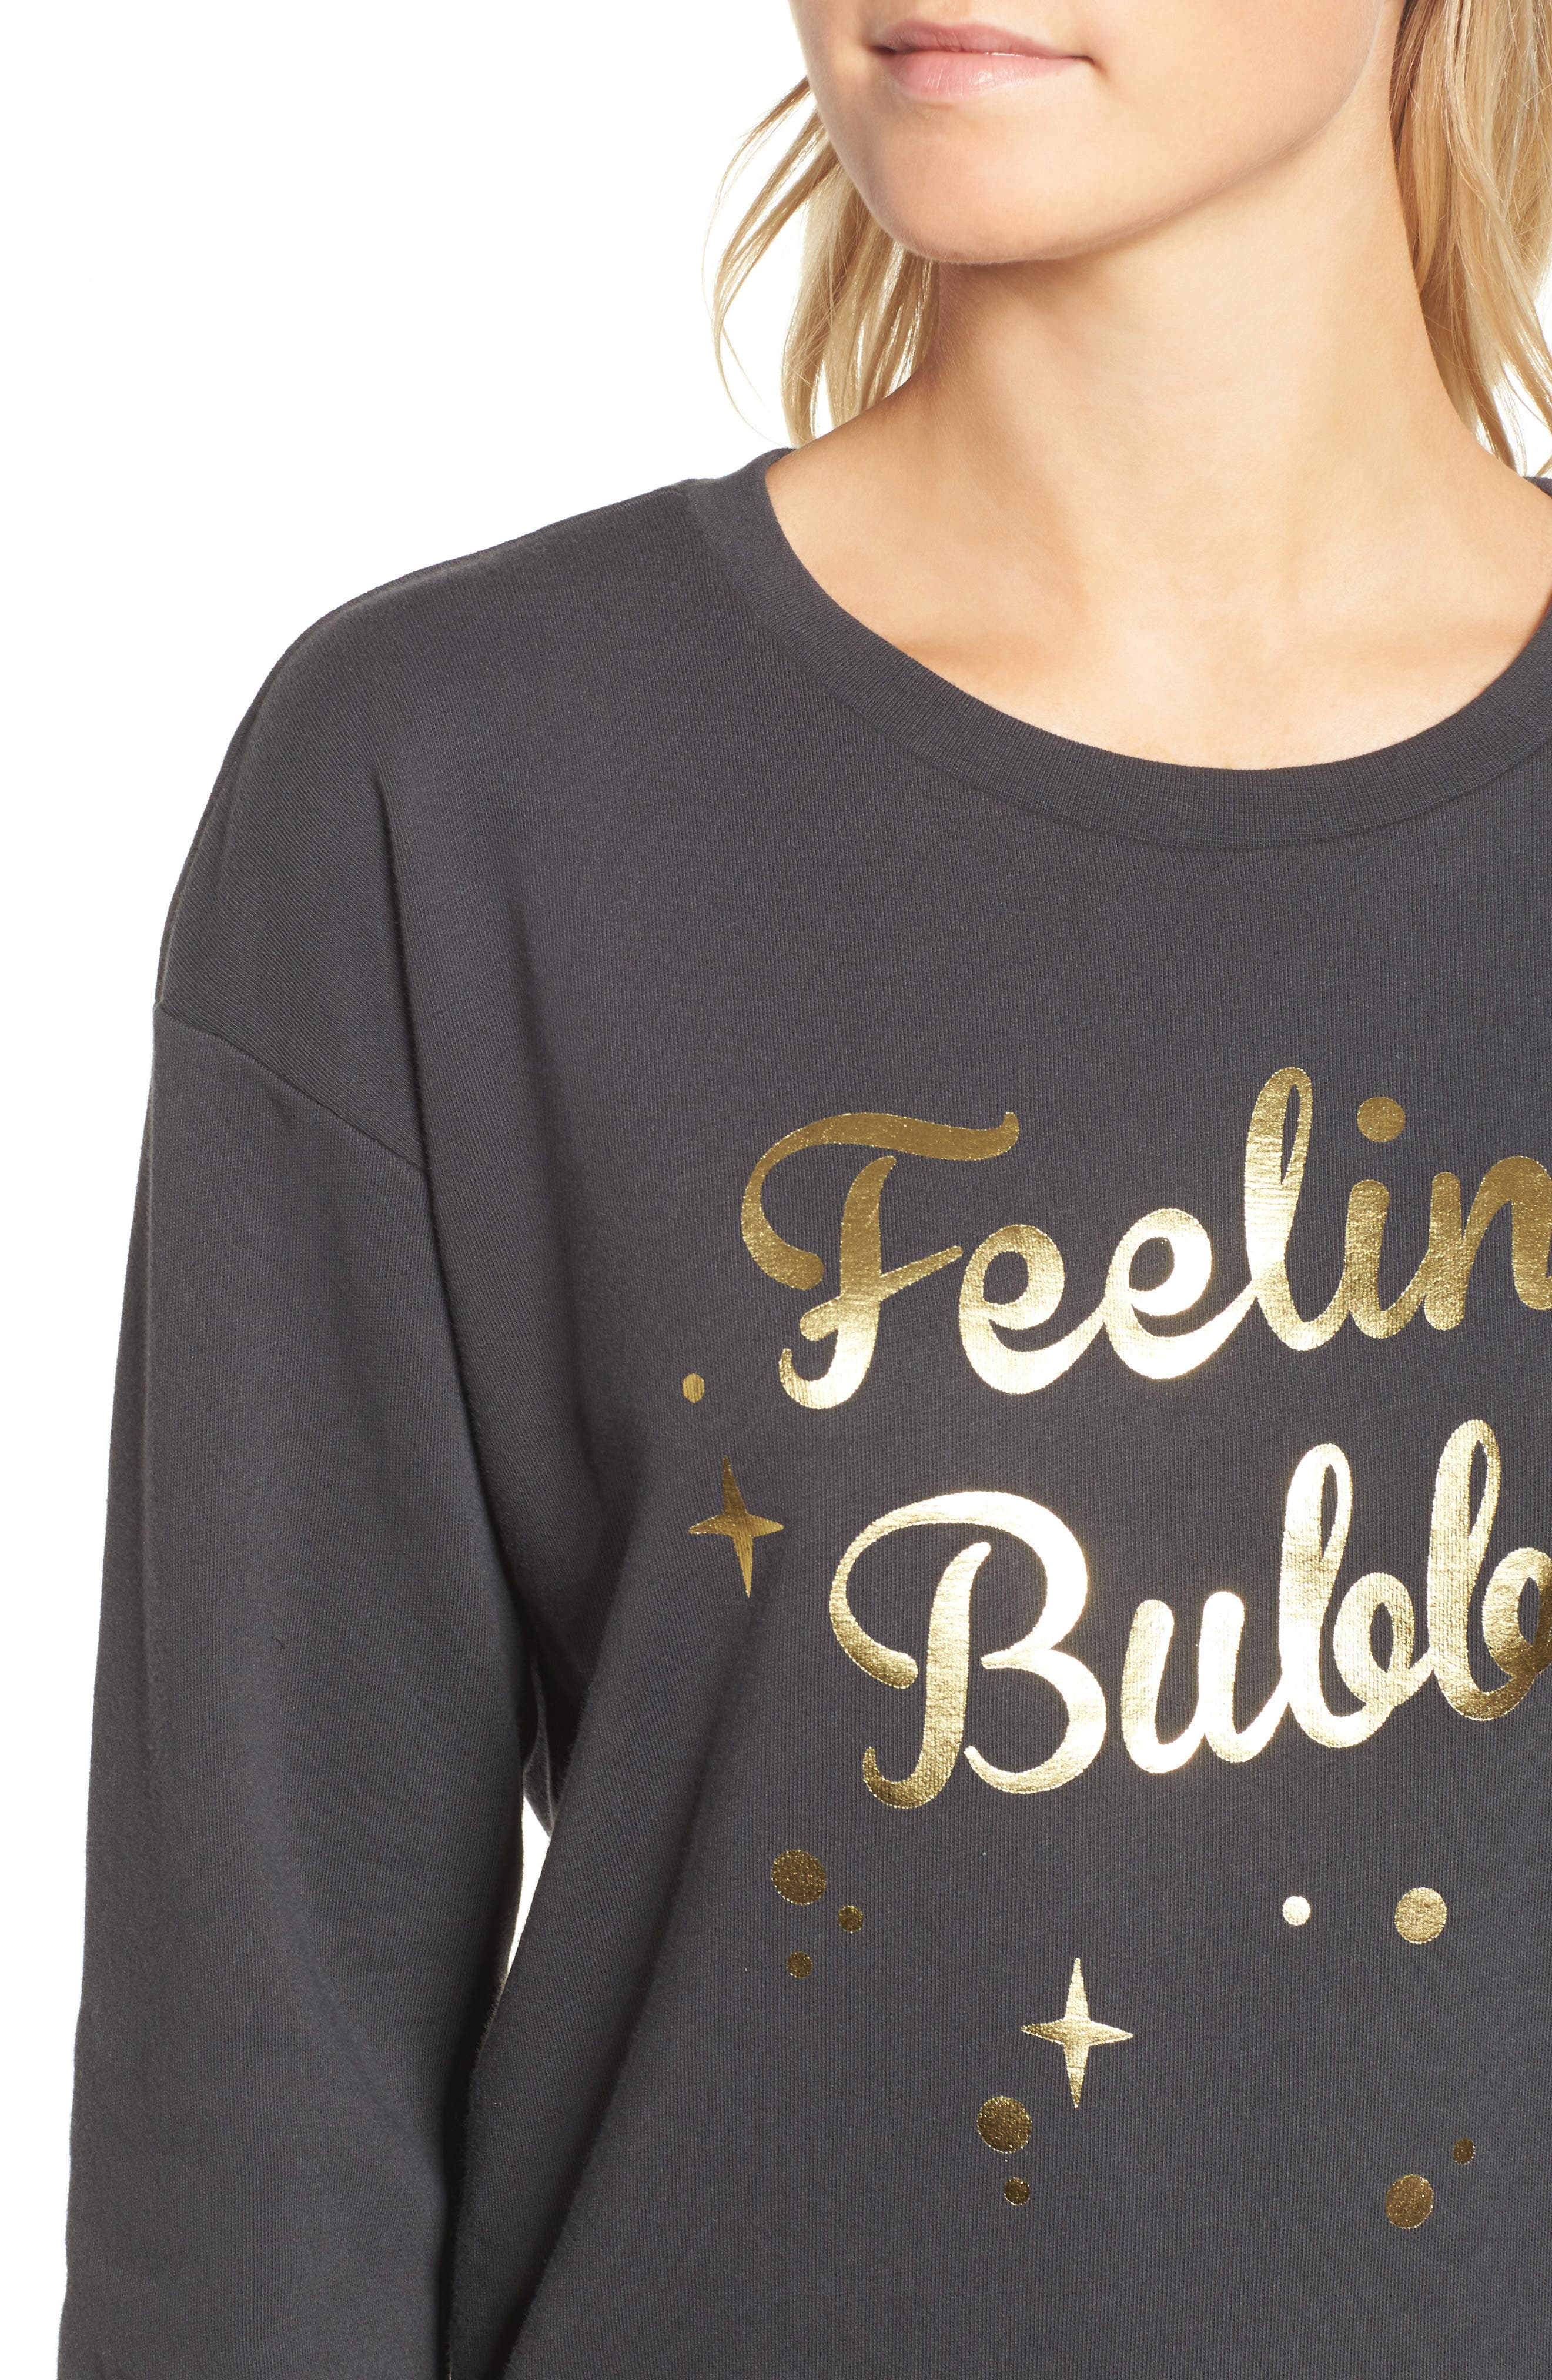 Feeling Bubbly Sweatshirt,                             Alternate thumbnail 4, color,                             Black